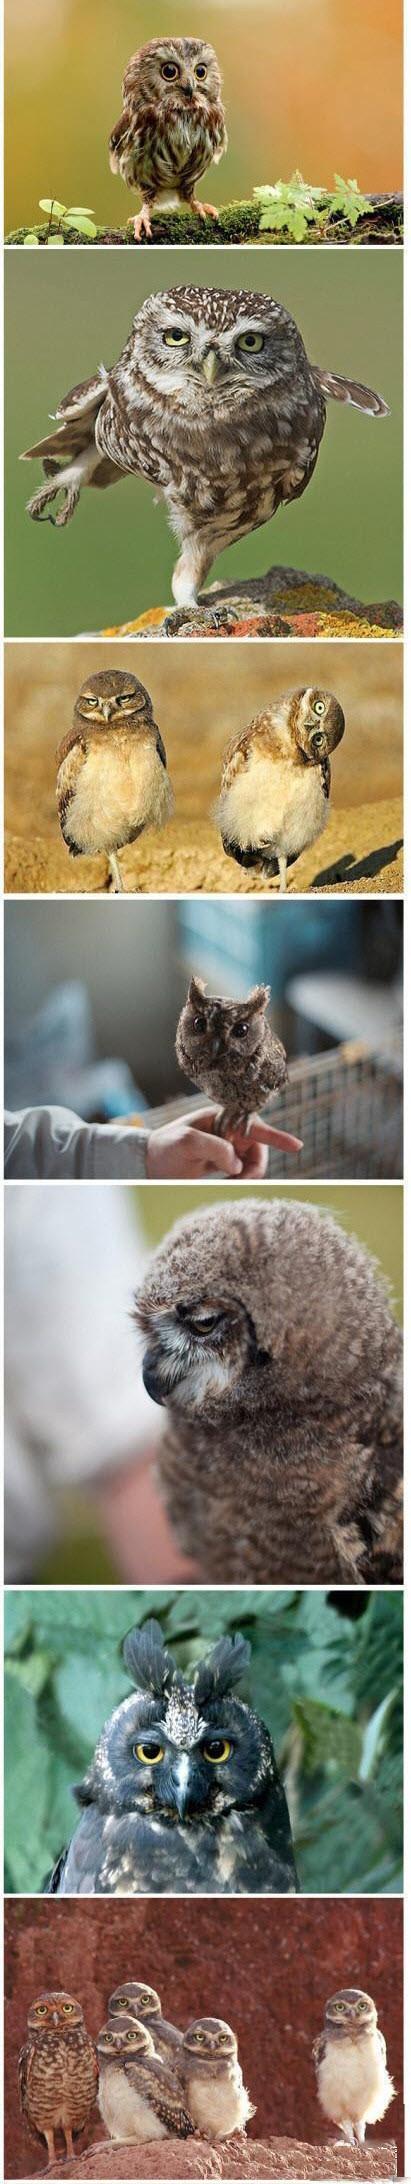 owls owls owls!ooooooooooooooooooooooooooooooooooooooooooooooowwwwwwwwwwwwwwwwwwwwwwwwwwwwwwwwwwwwwwwwwwwwwwwwwwwwwwwwwwwwwwwwwwwwwwwwwwwwwllllllllllllllllllllllllllllllllllllllllllllllllllllllllllllllllllllllllllllllllllllllllllllllllllllllllllllllllllllllllssssssssssssssssssssssssssssssssssssssssssssssssssssssssssssssssssssssssssssssssssssssssssssssssssssssssssssssssssssssssssssssssssssssssssssssssssssssssssssssssss